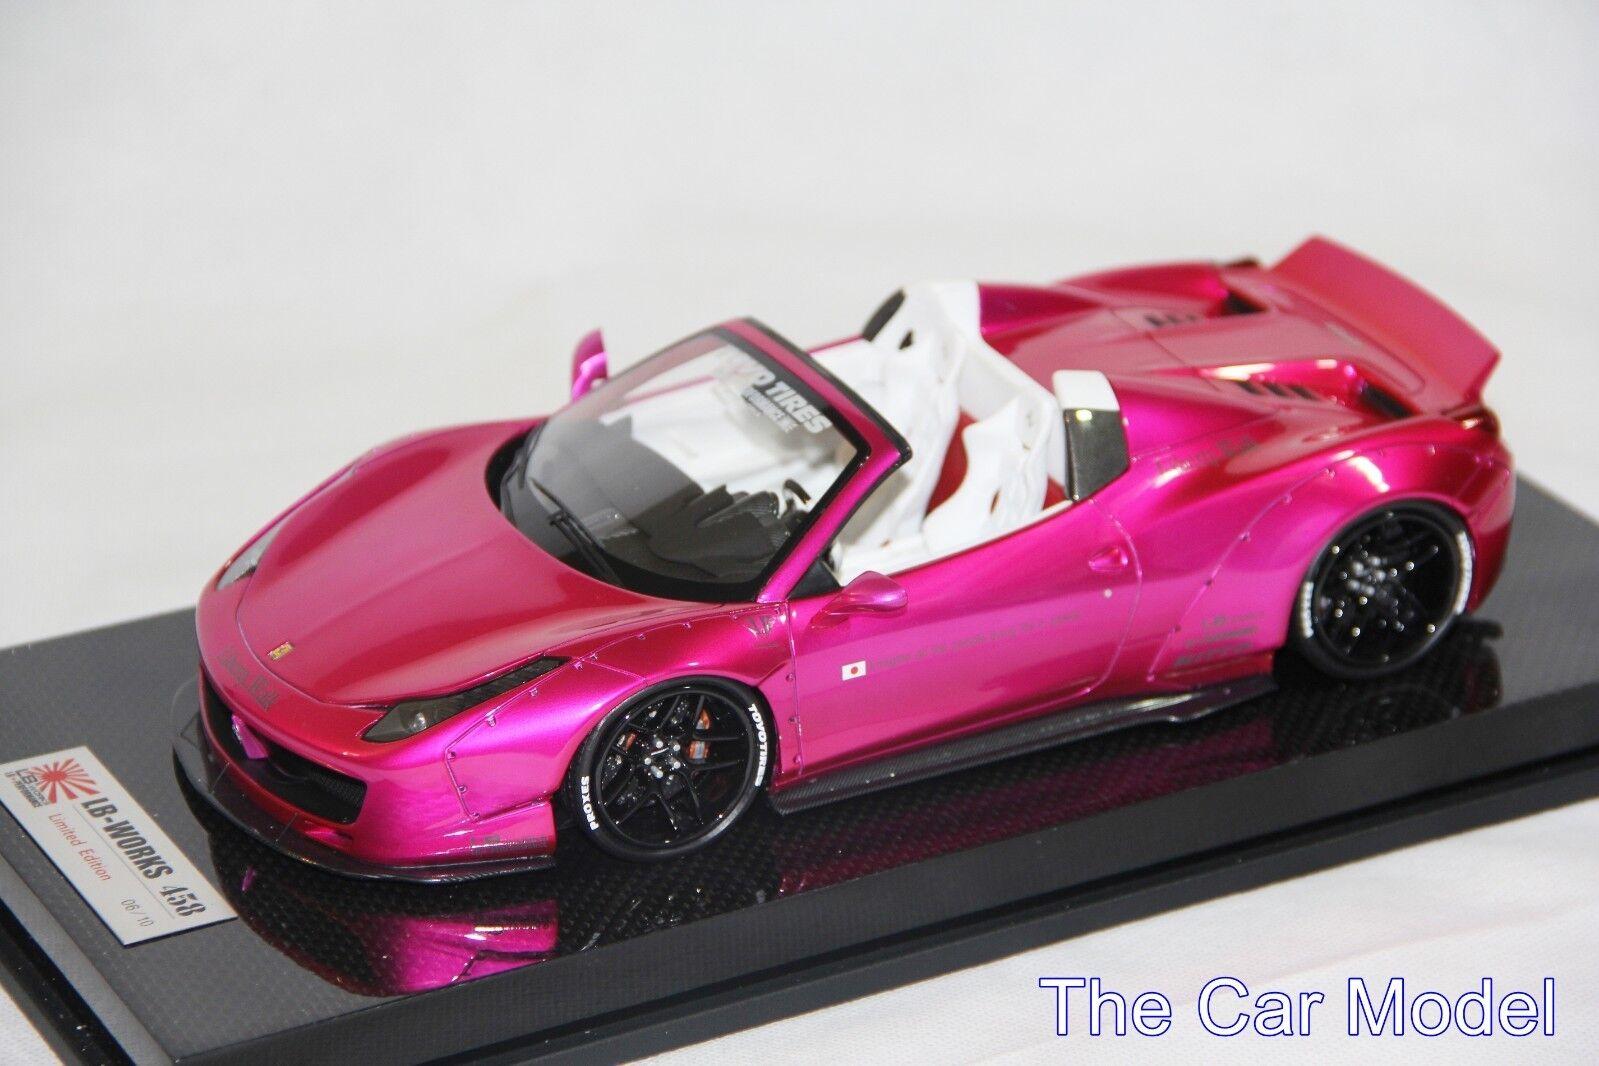 Ferrari 458 Spider LB Works Performance Flash Pink, Carbon Base - 10 pcs LB 1 18